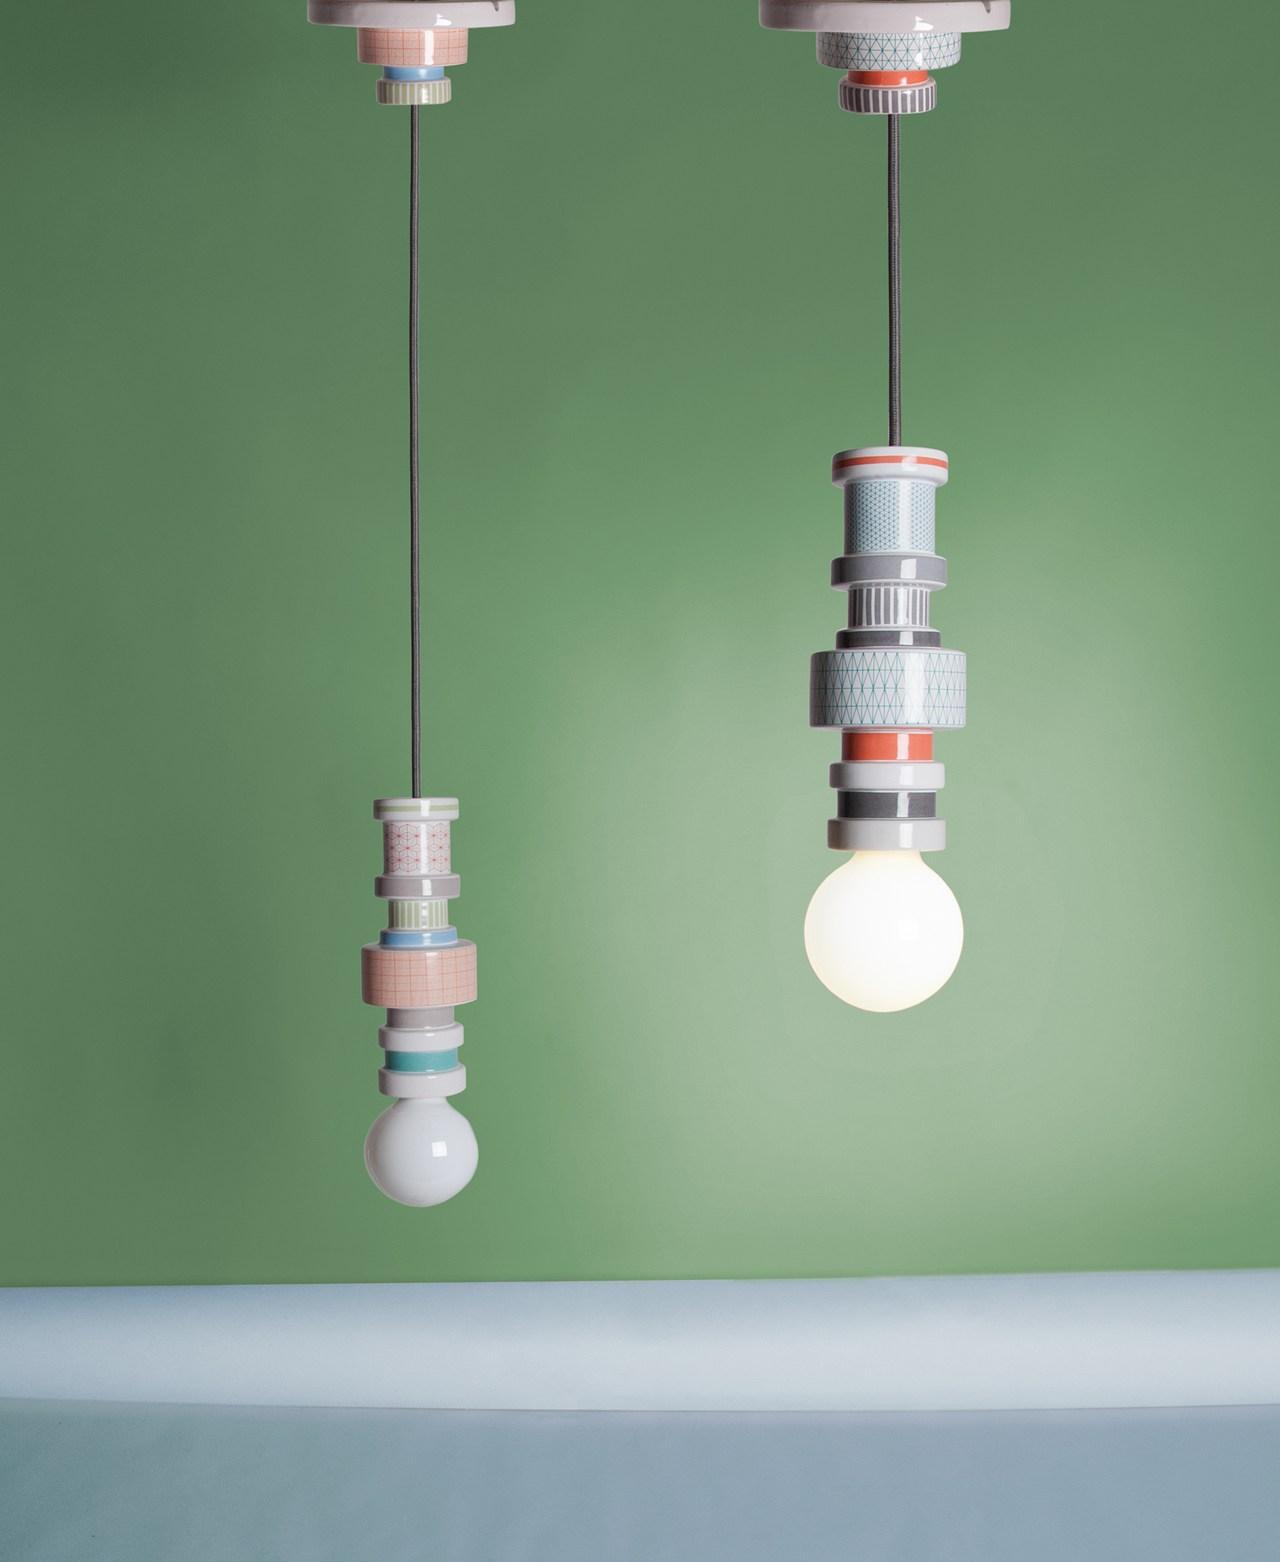 Moresque Pendant Lamps by Alessandro Zambelli for Seletti